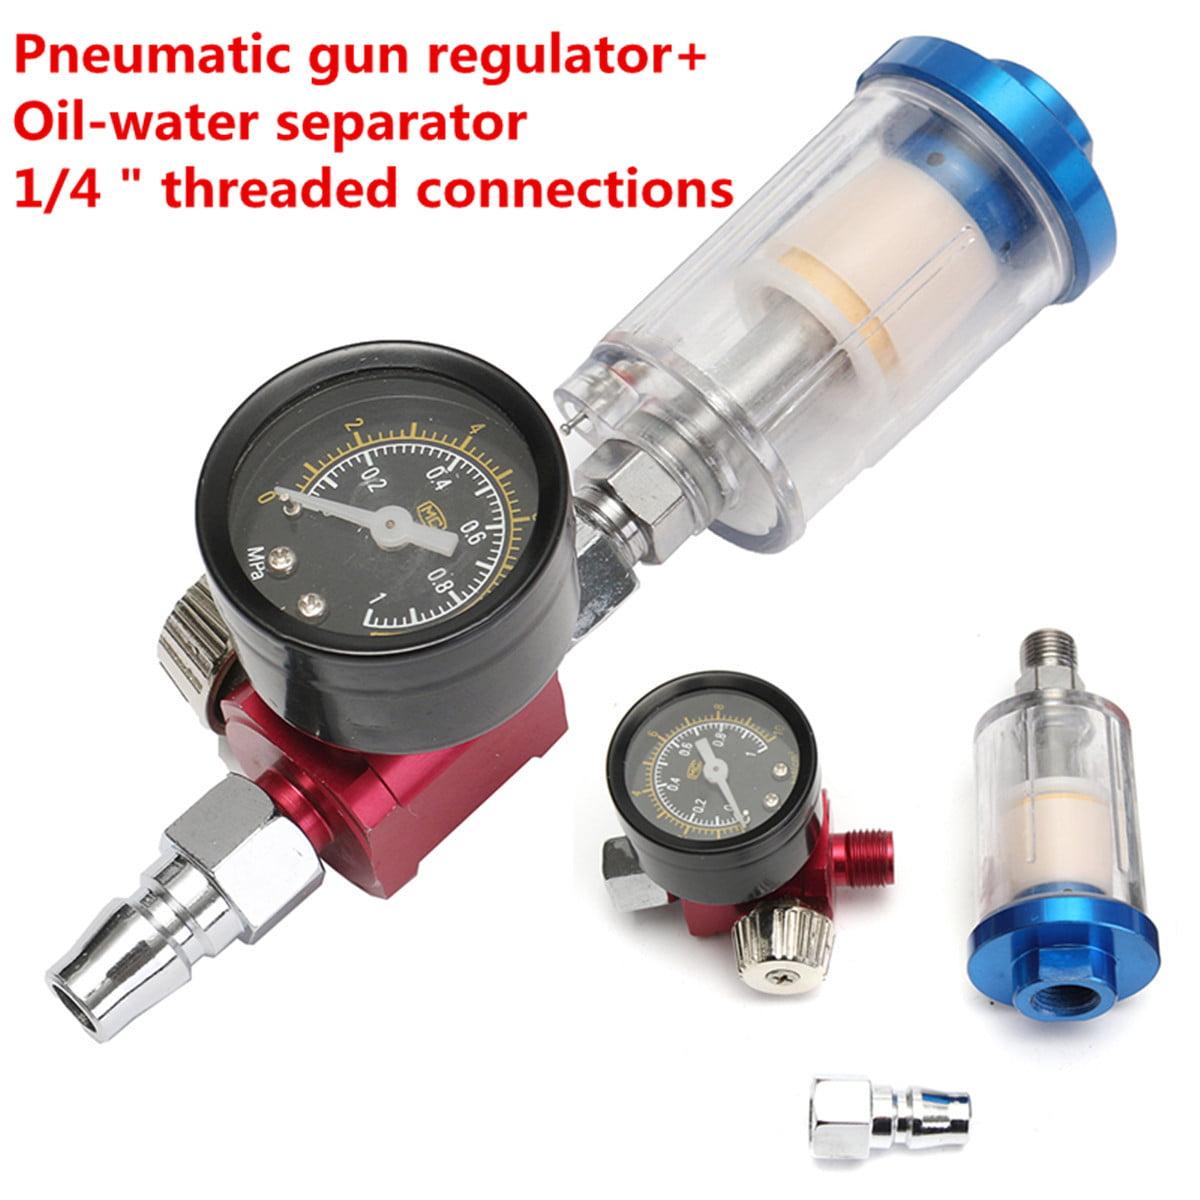 1xAir Pressure Regulator Gauge Spray Gun In-Line Water Separator Oil Trap Filter